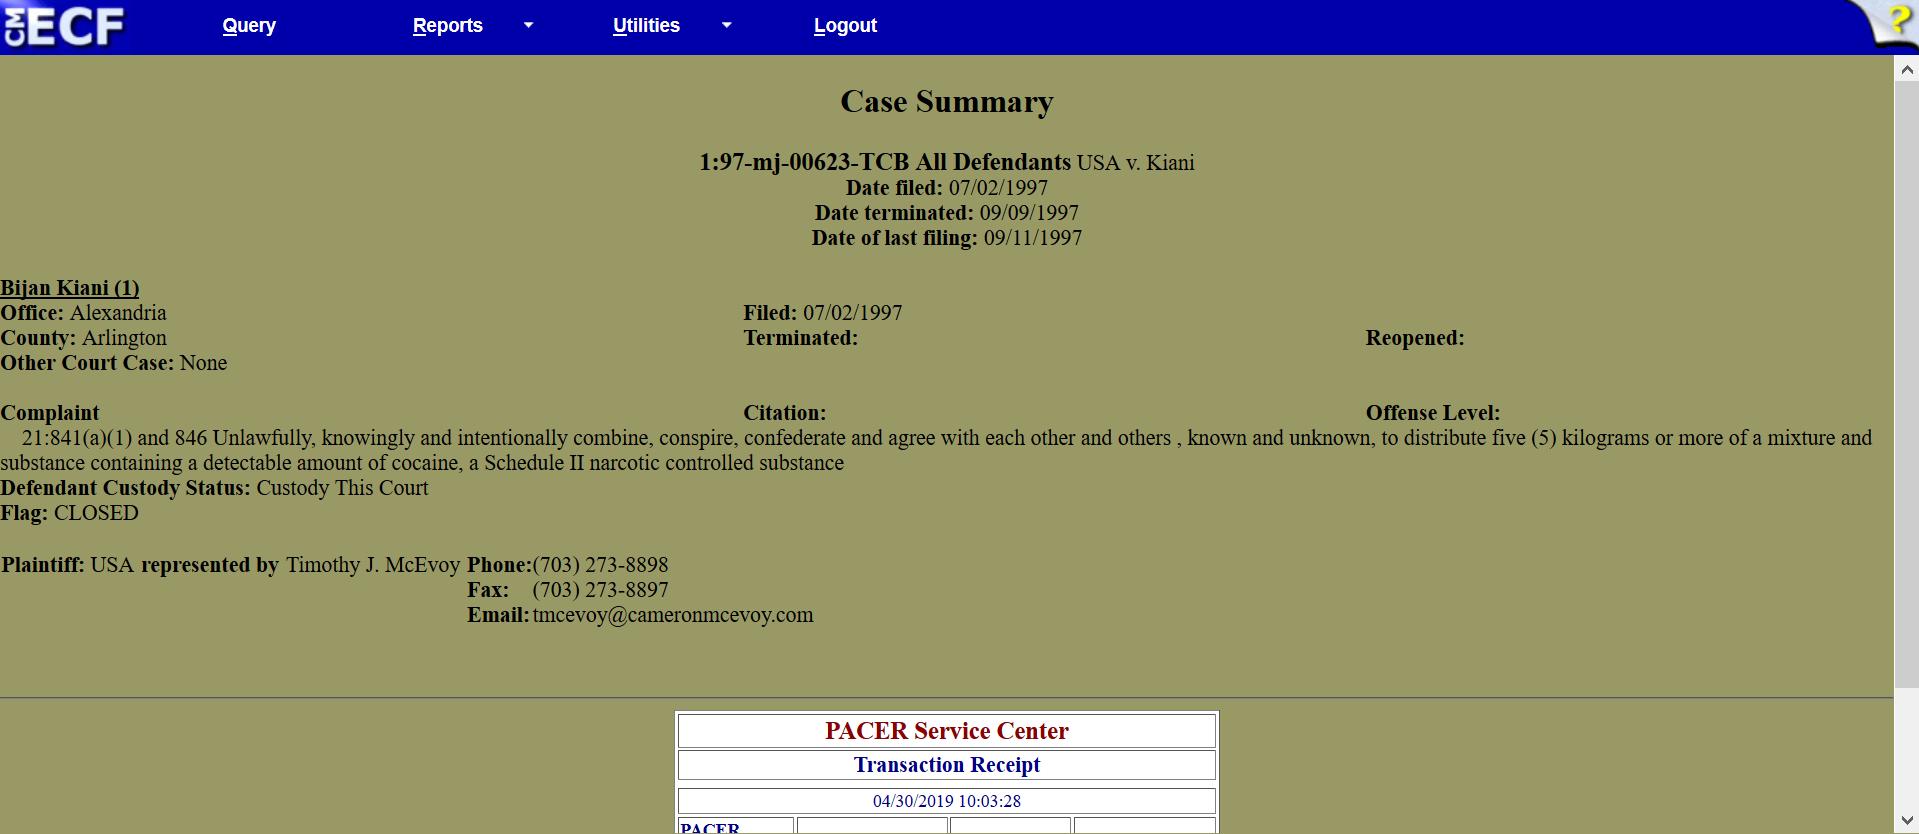 Kian five kilos of cocaine 1997 case also in Alexandria.png